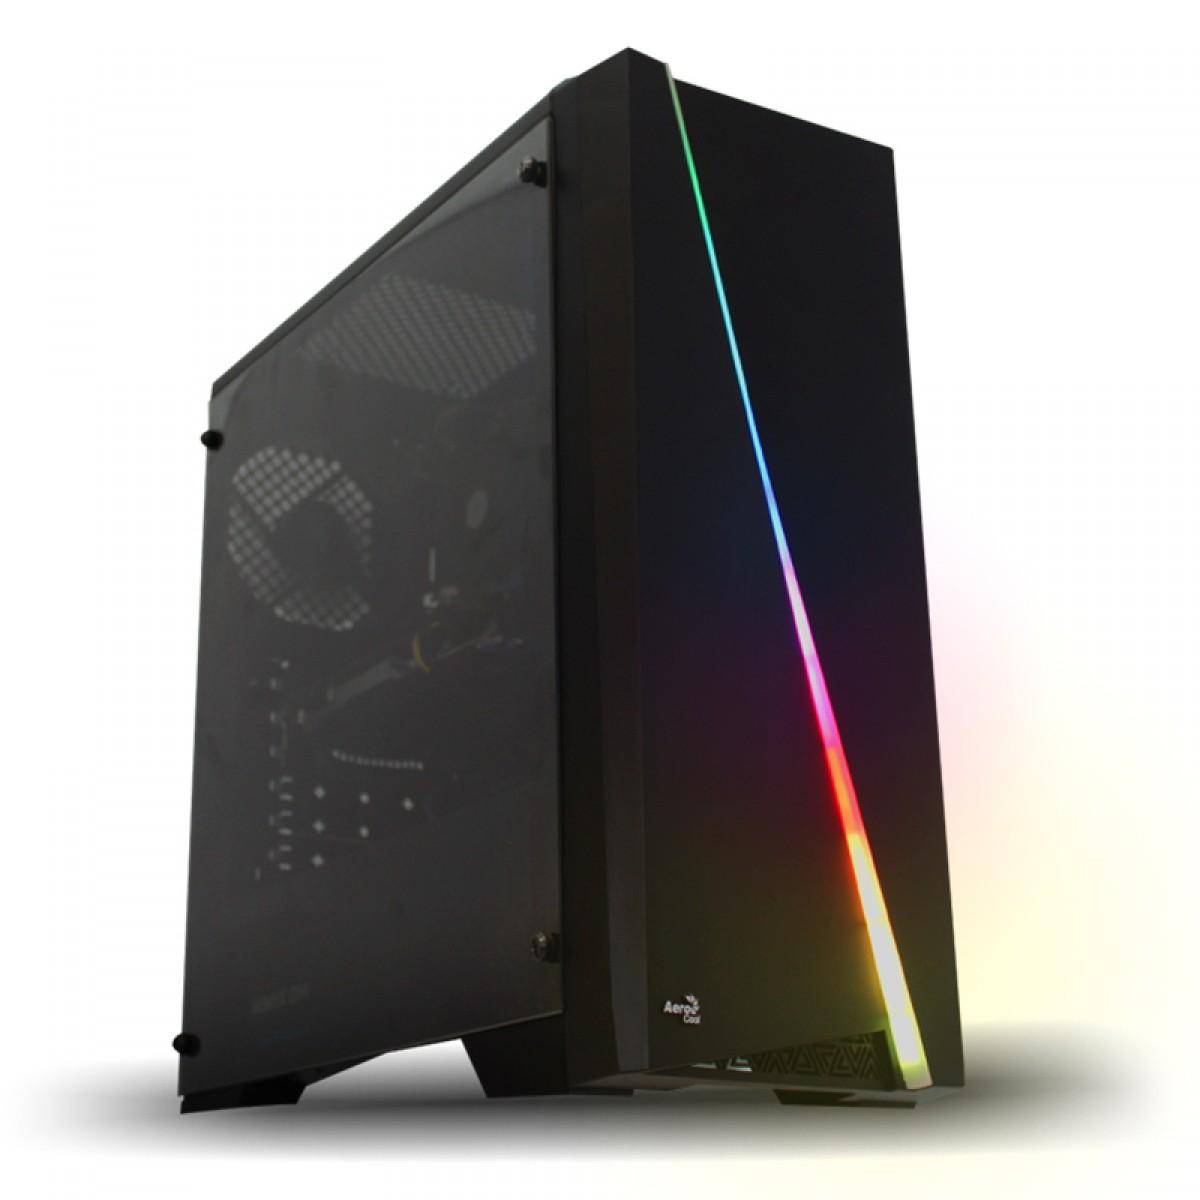 PC Gamer T-Power Inferno LVL-3 Intel I9 9900KF 3.60GHZ / Geforce RTX 2080 8GB / DDR4 16GB / HD 1TB / 700W